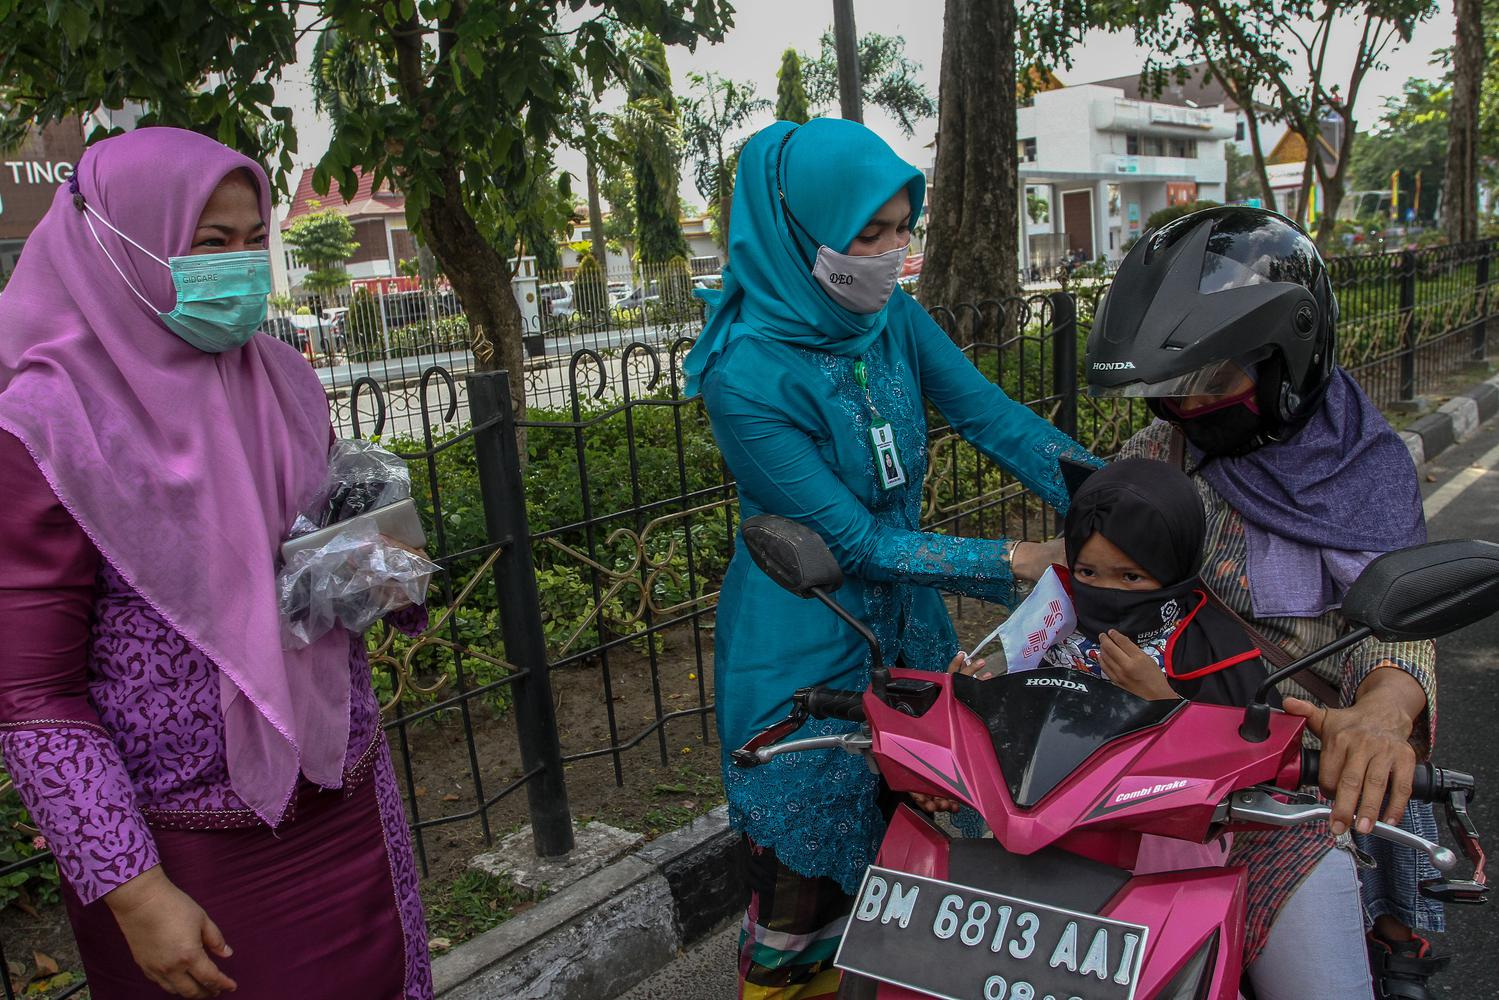 Pegawai dari Dinas Kesehatan Provinsi Riau bersama komunitas relawan membantu memasangkan masker kepada pengguna jalan raya di Jalan Sudirman, Pekanbaru, Riau, Kamis (12/11/2020). Dalam memperingati Hari Kesehatan Nasional yang ke-56 Dinas Kesehatan Provinsi Riau membagikan sebanyak tujuh ribu masker untuk masyarakat sekaligus mengingatkan kembali untuk tetap mematuhi protokol kesehatan COVID-19.